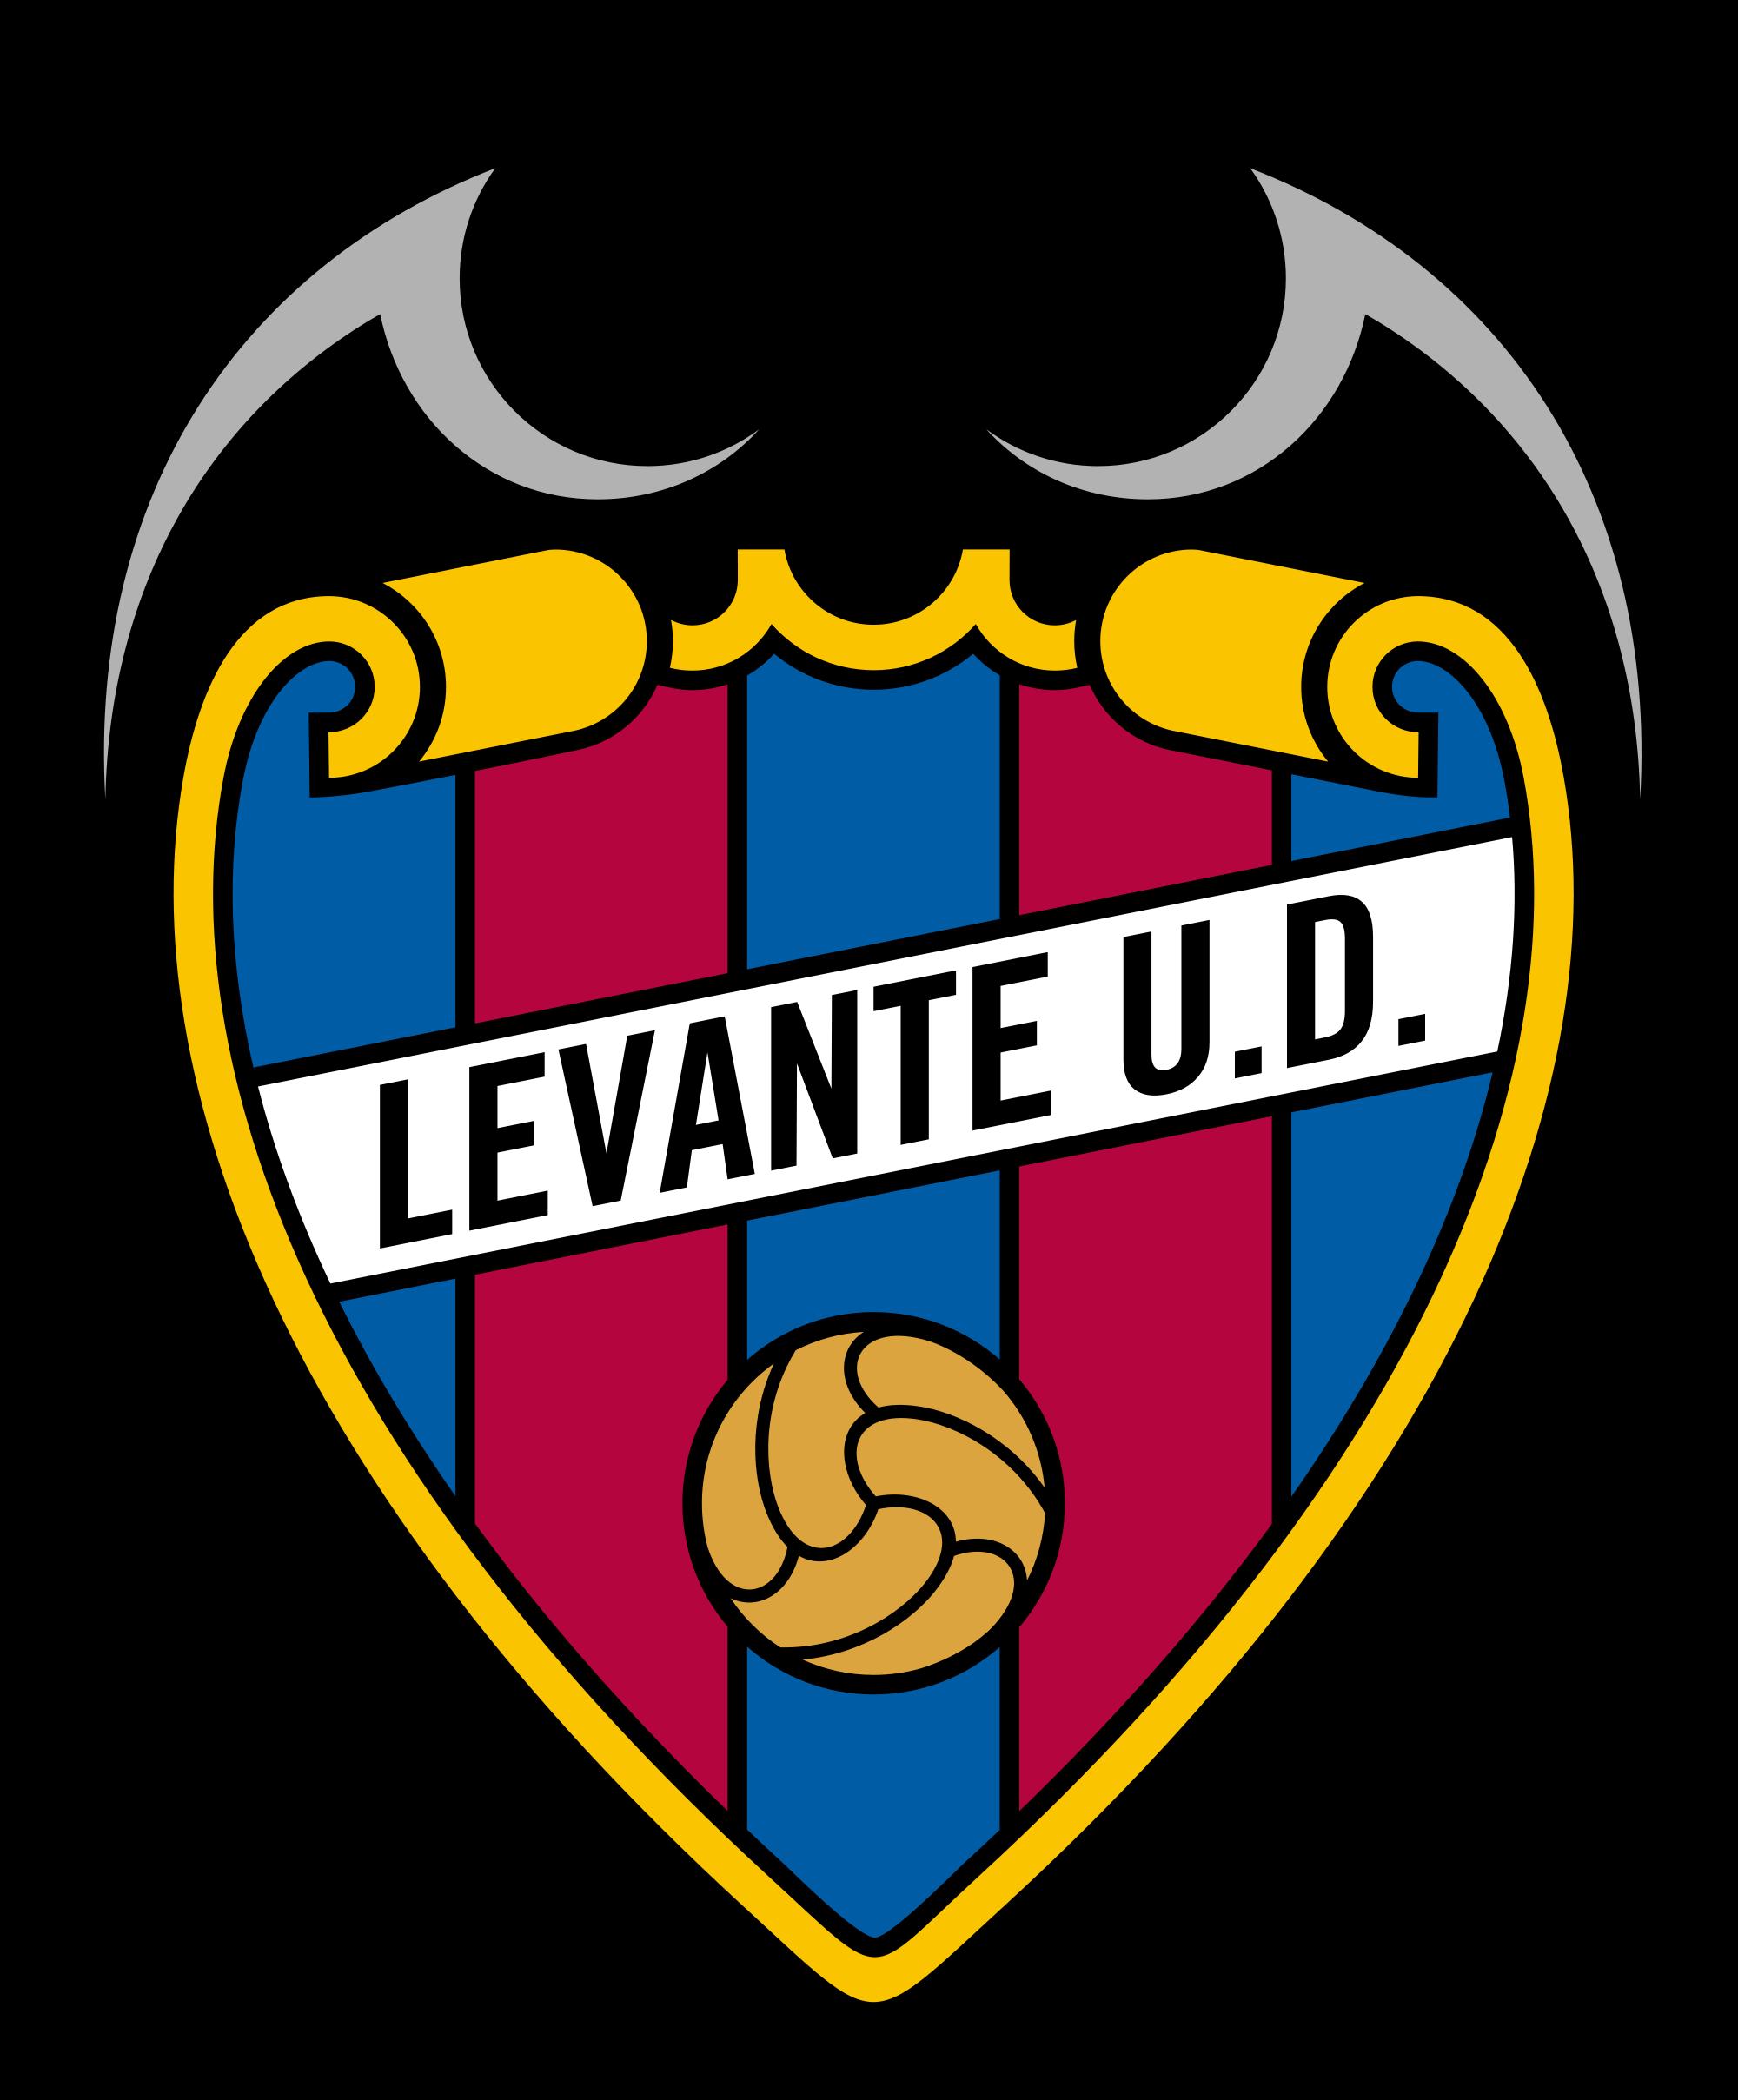 Levante UD Logo Wallpaper